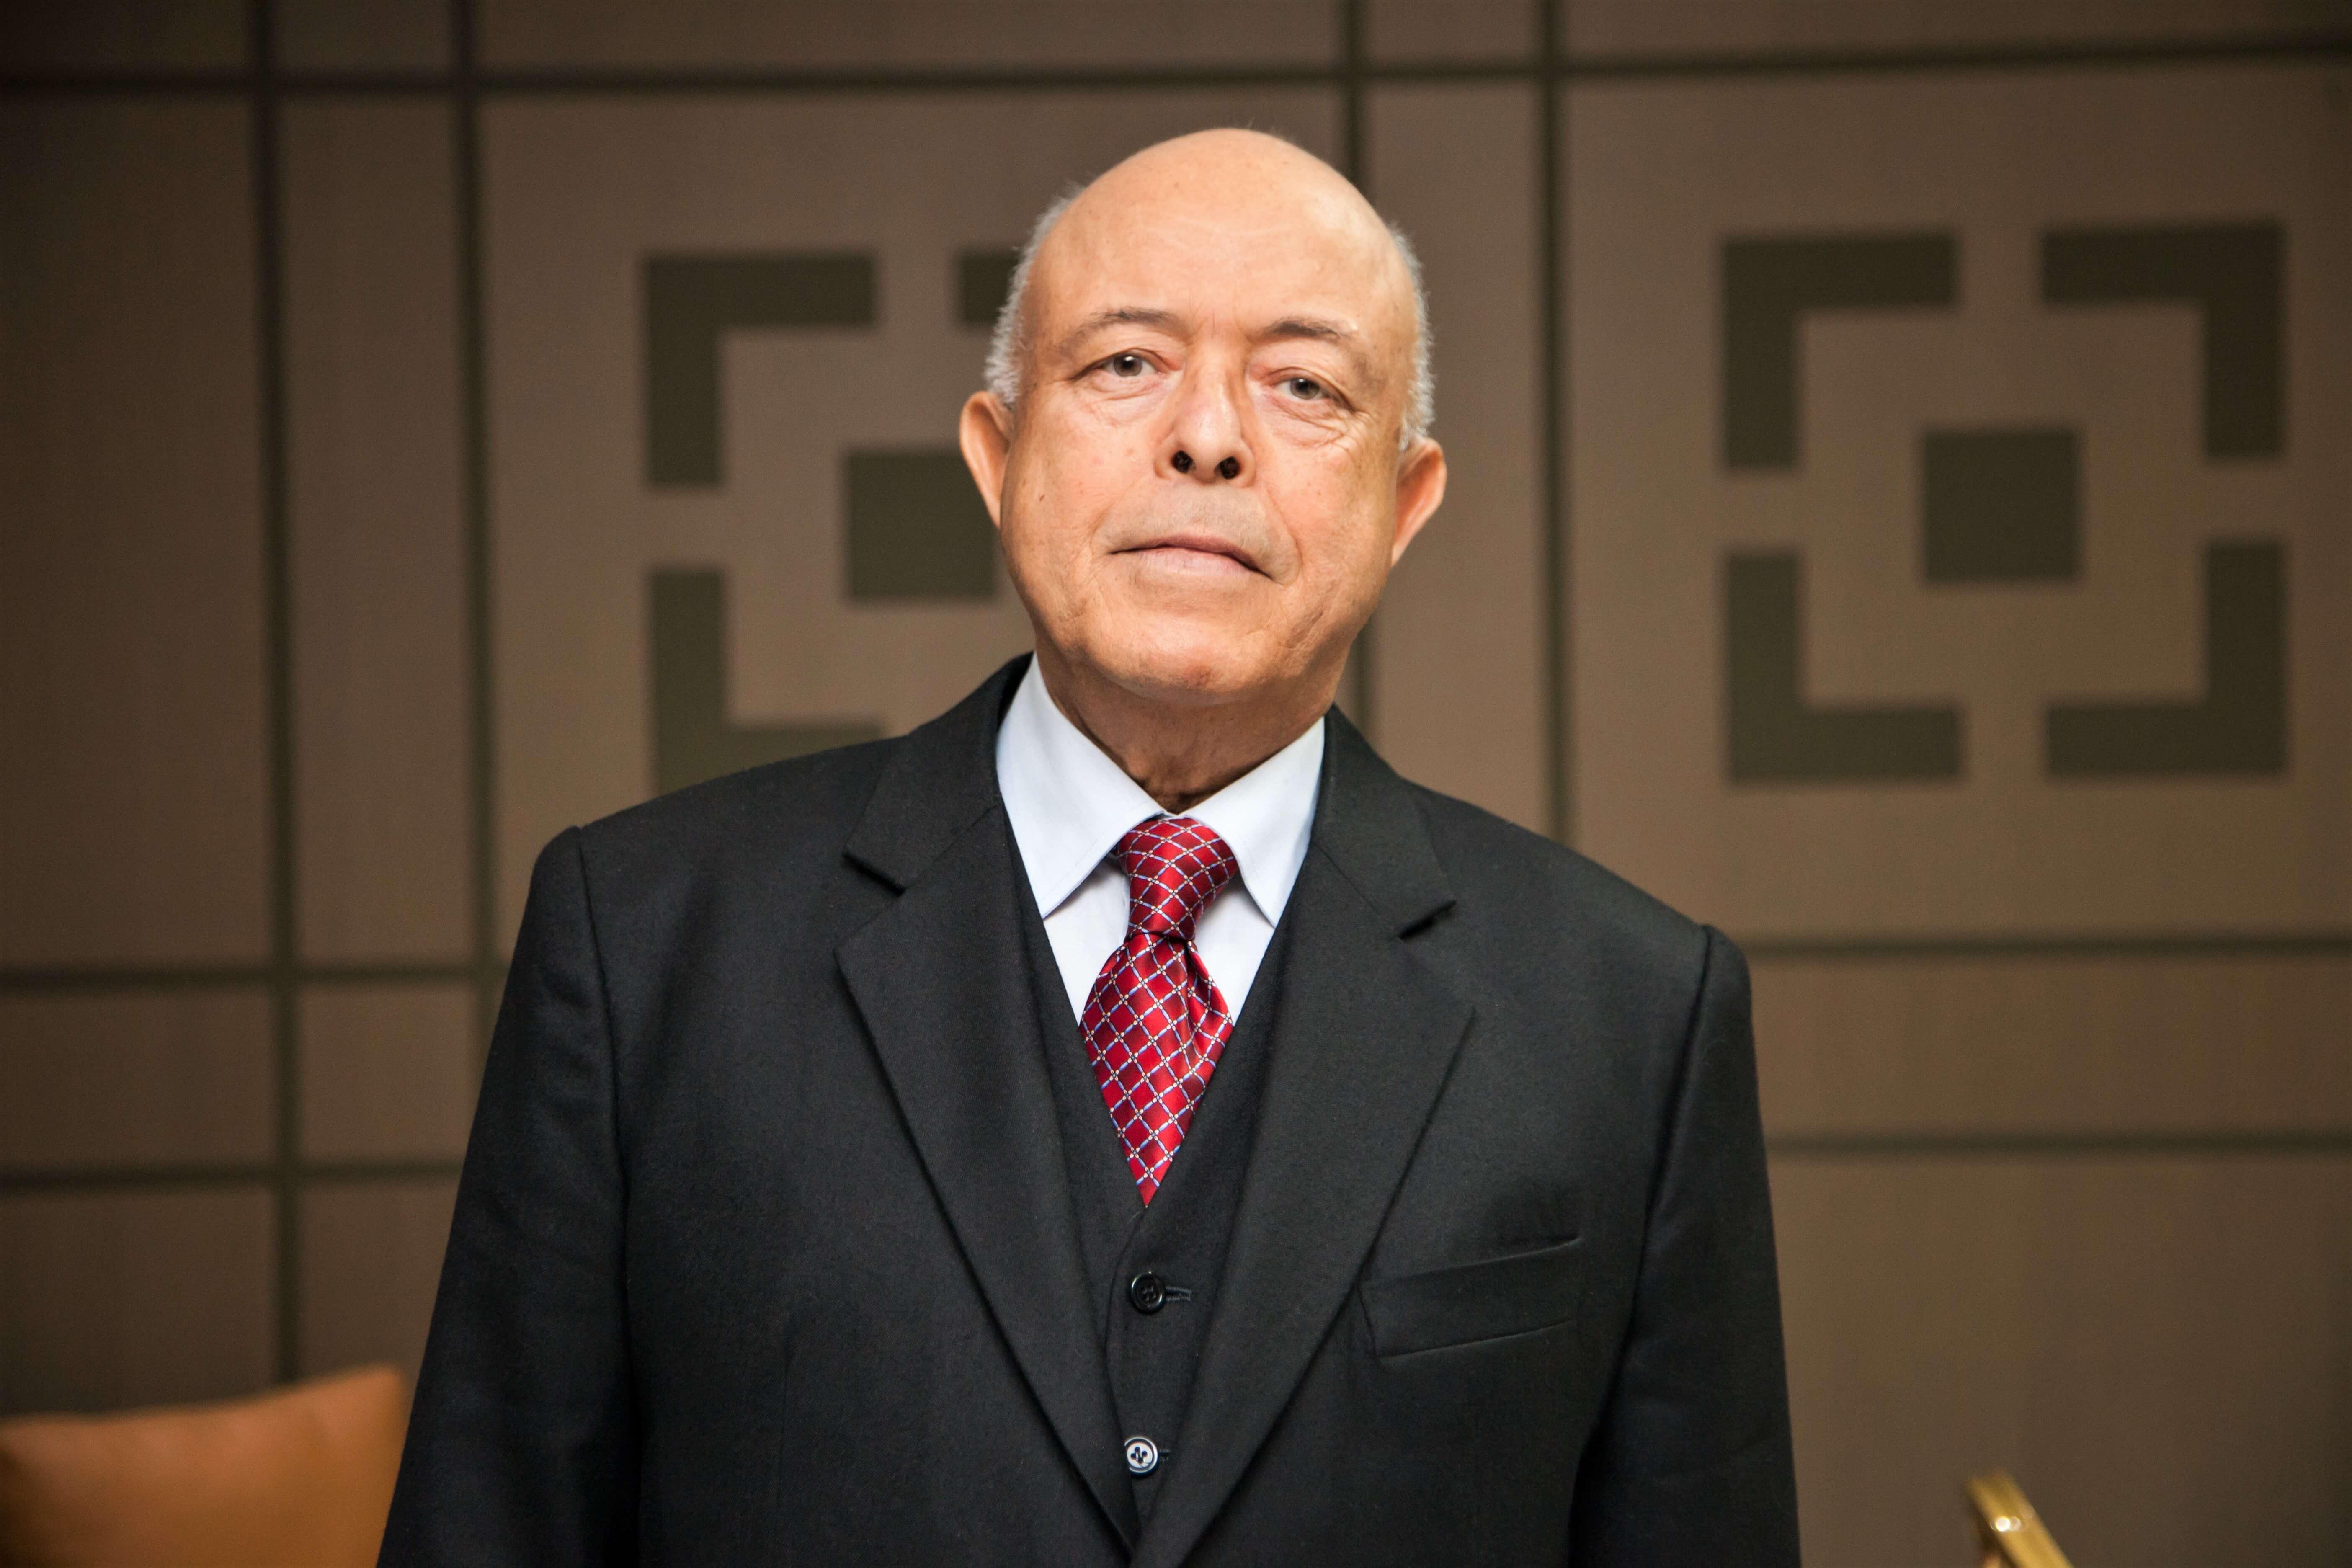 Mr. Hafedh Maamouri